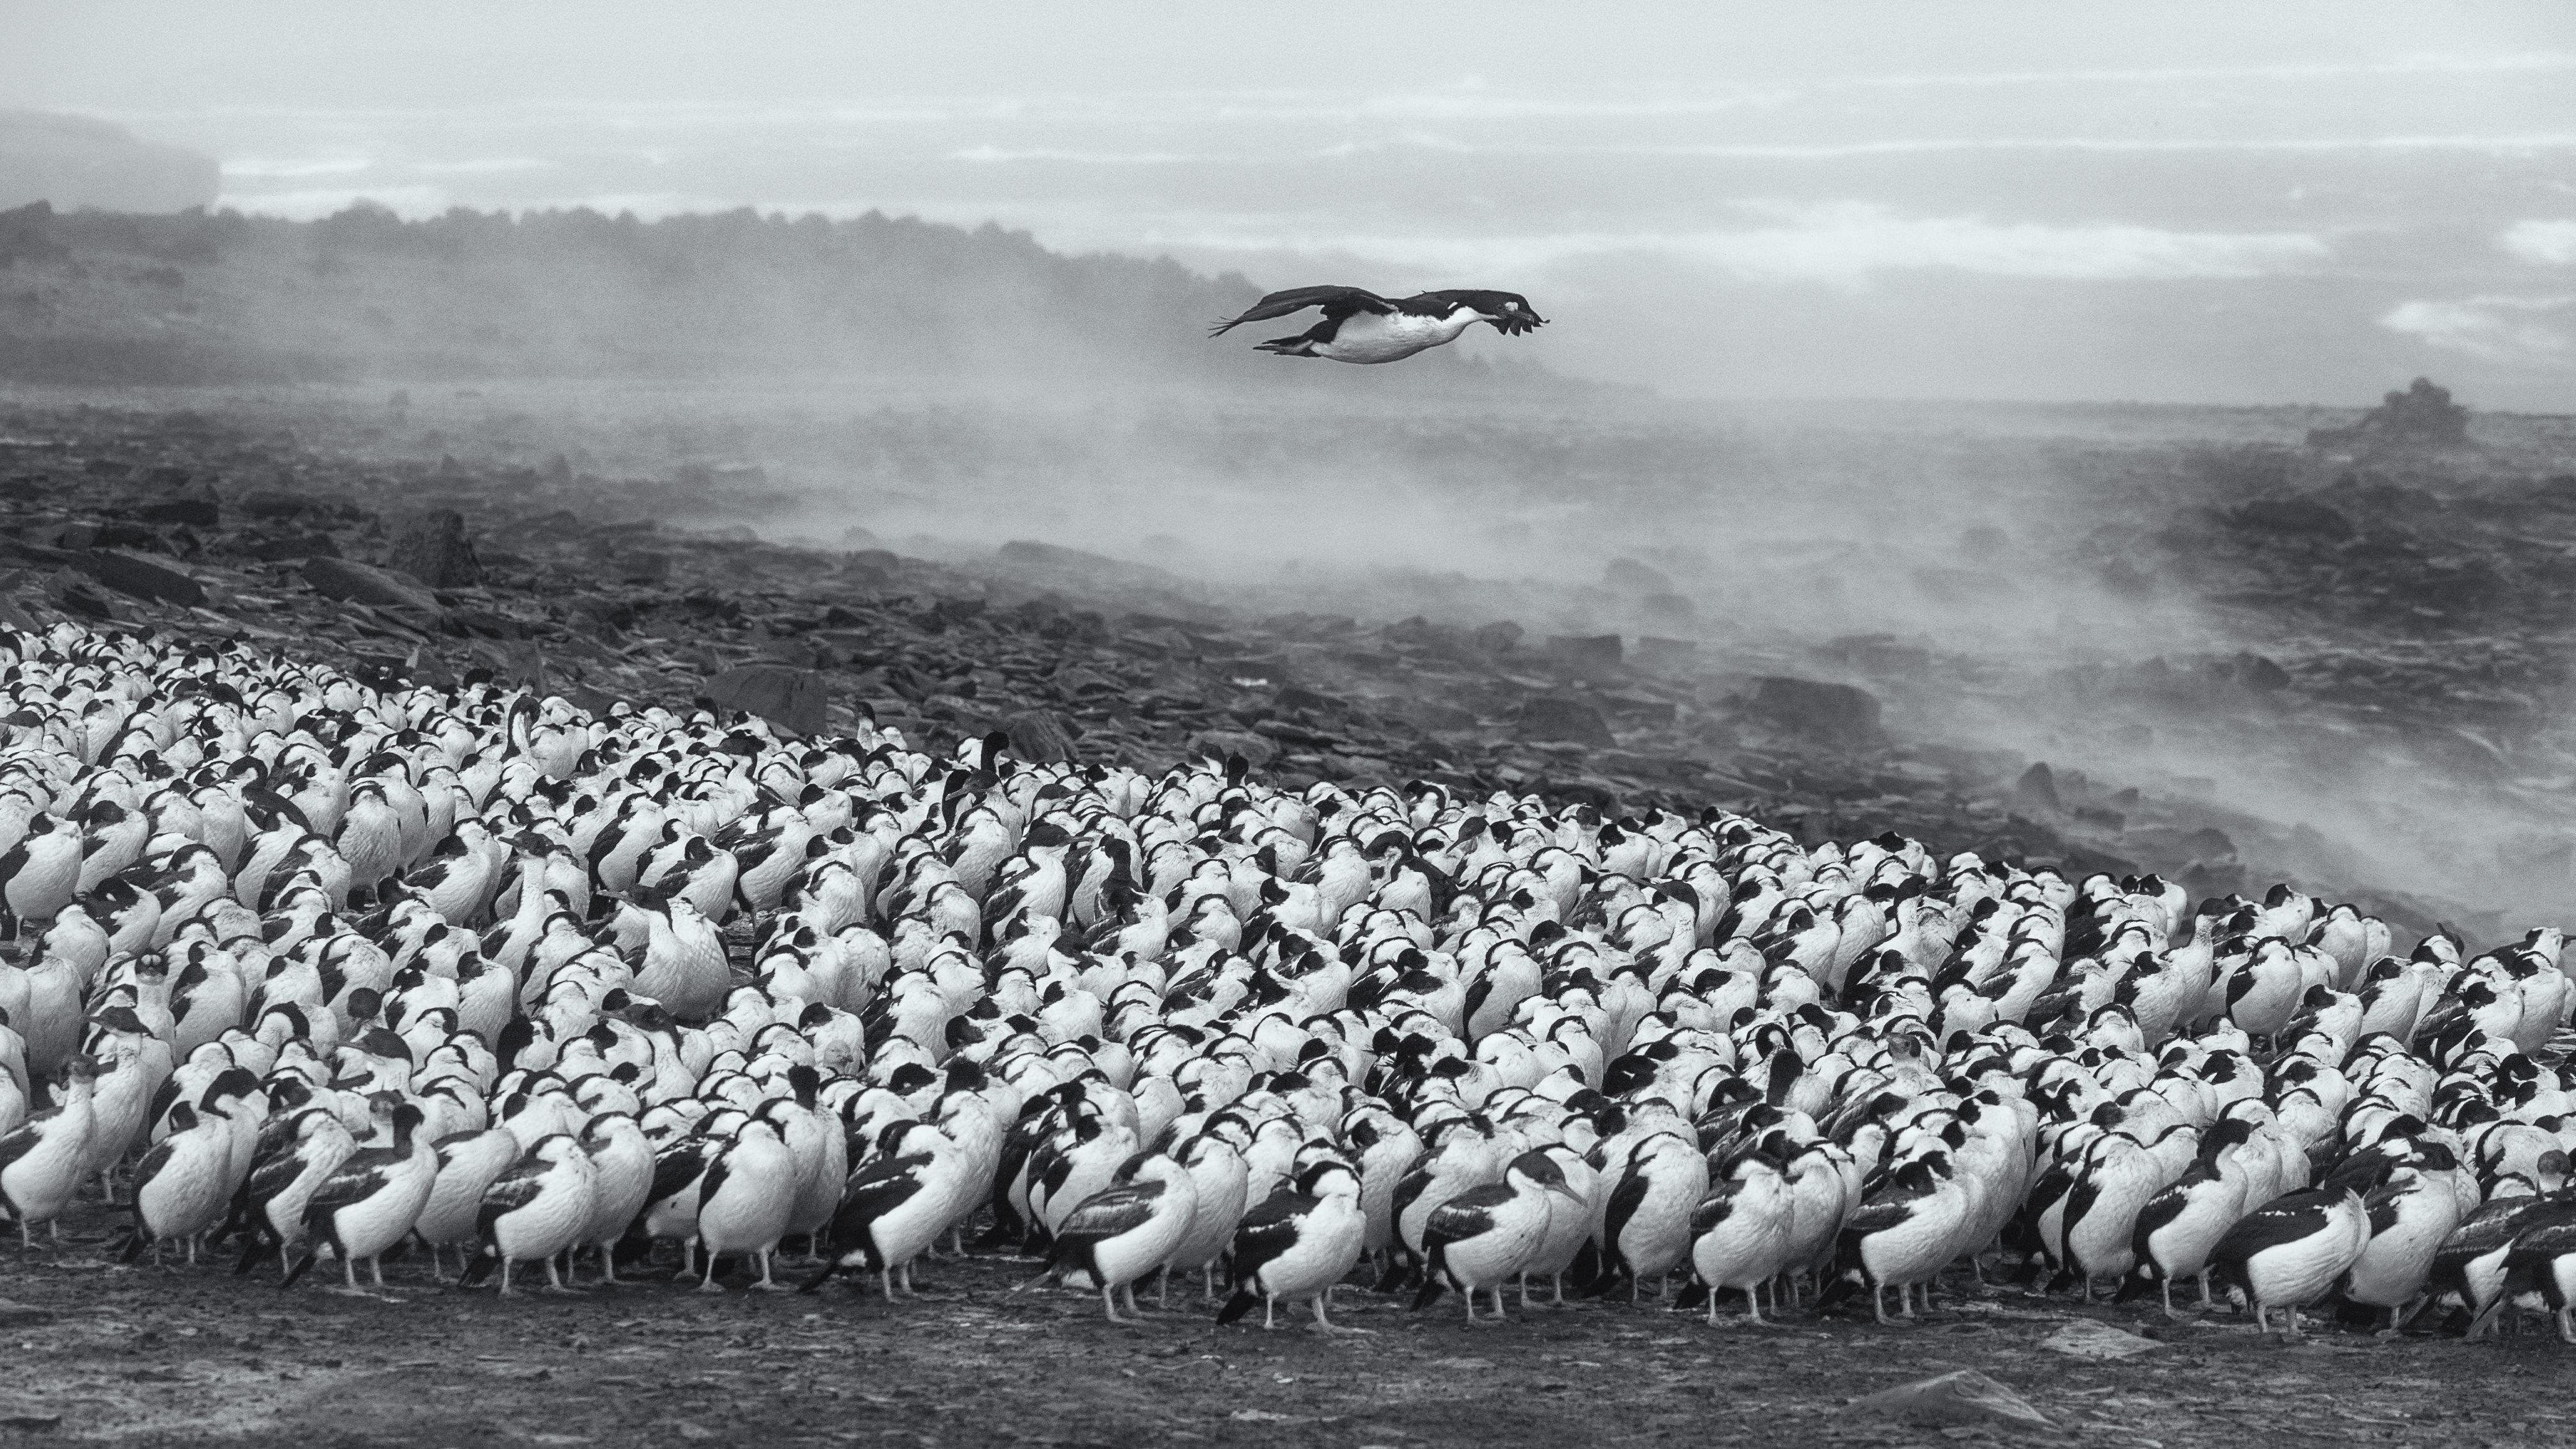 Rockhopper penguins on Sea Lion Island, Falkland Islands. Photo taken by Murray Foote on November 4, 2015.